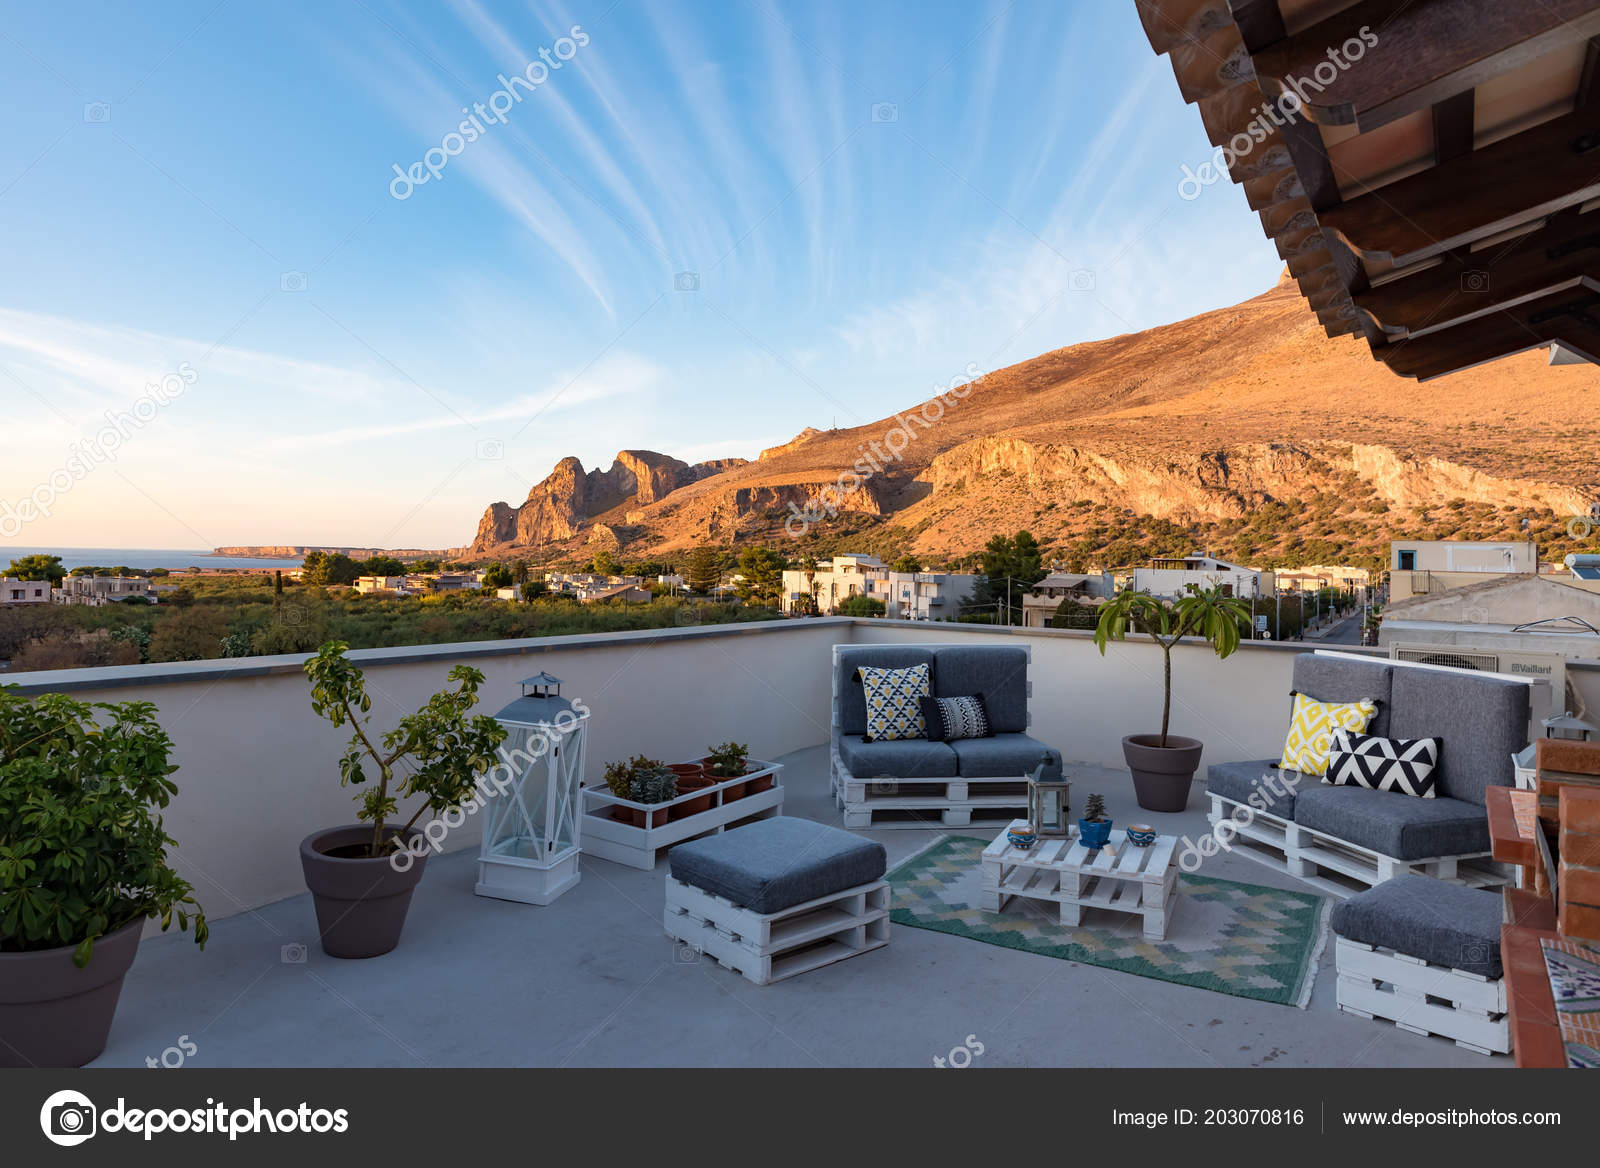 Muebles Terraza Jardín Foto De Stock Fpwing C 203070816